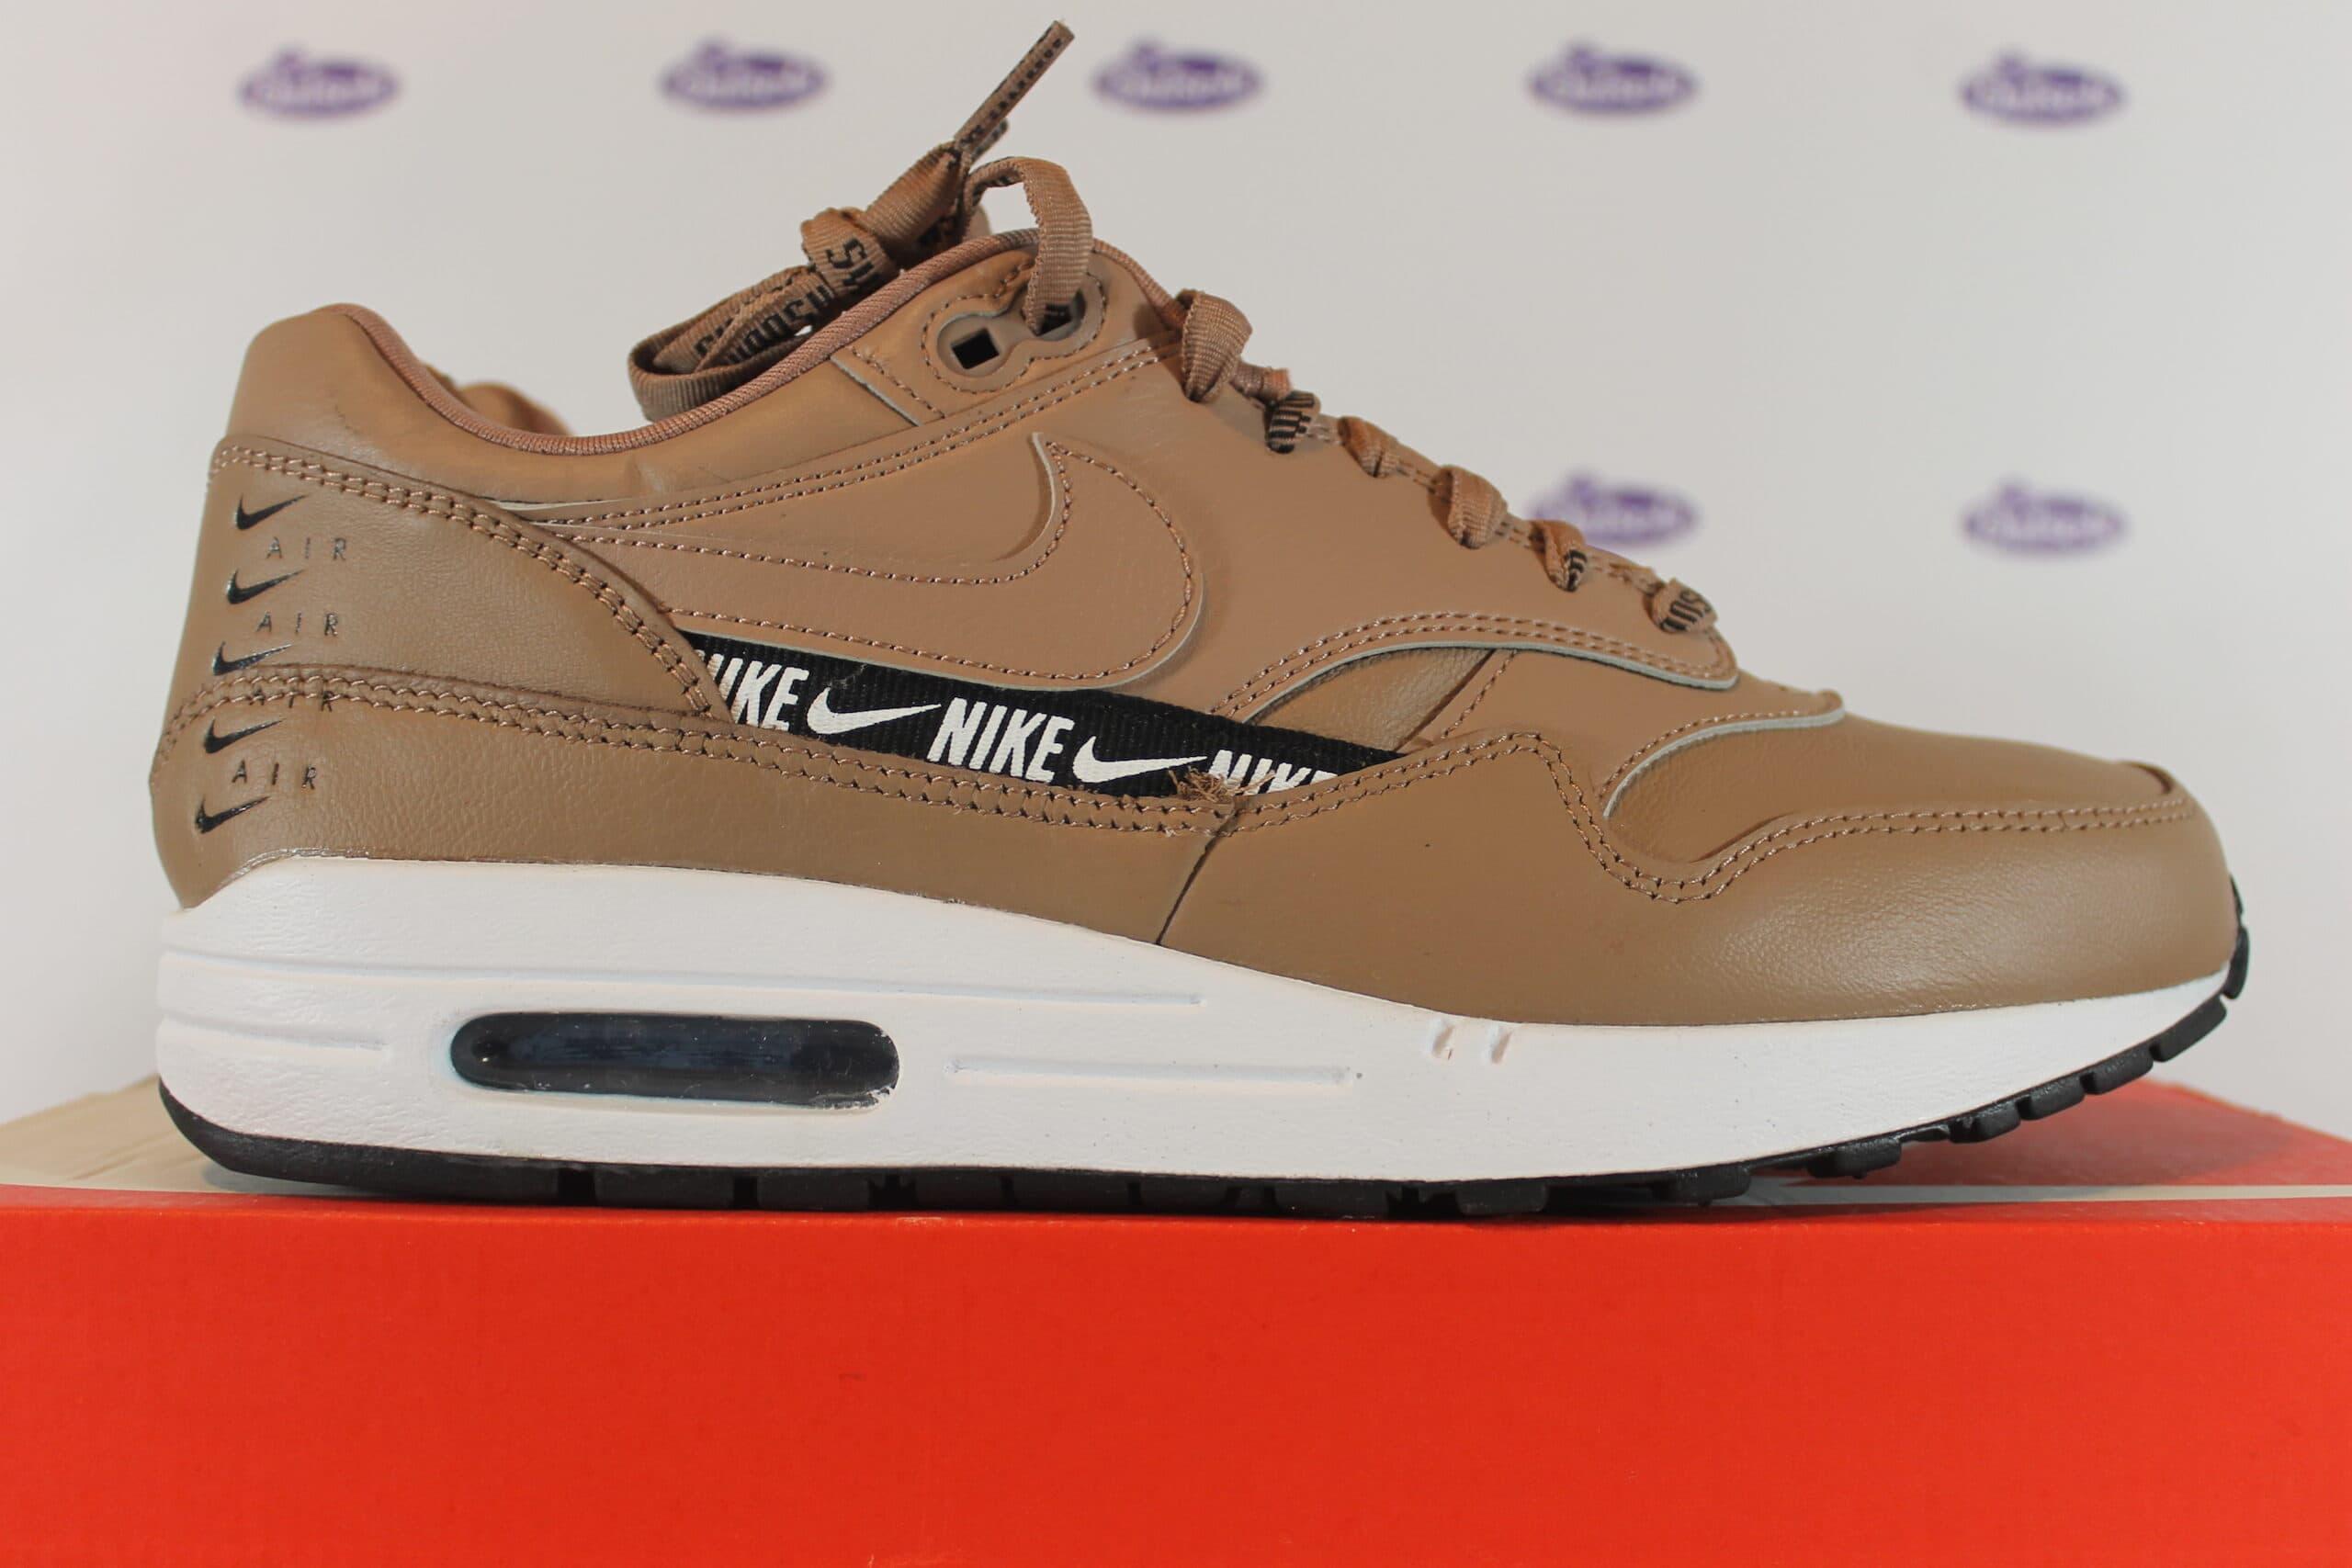 Vueltas y vueltas Solenoide hacerte molestar  Nike Air Max 1 SE Just Do It Light Desert Dust | ✅ Online at Outsole